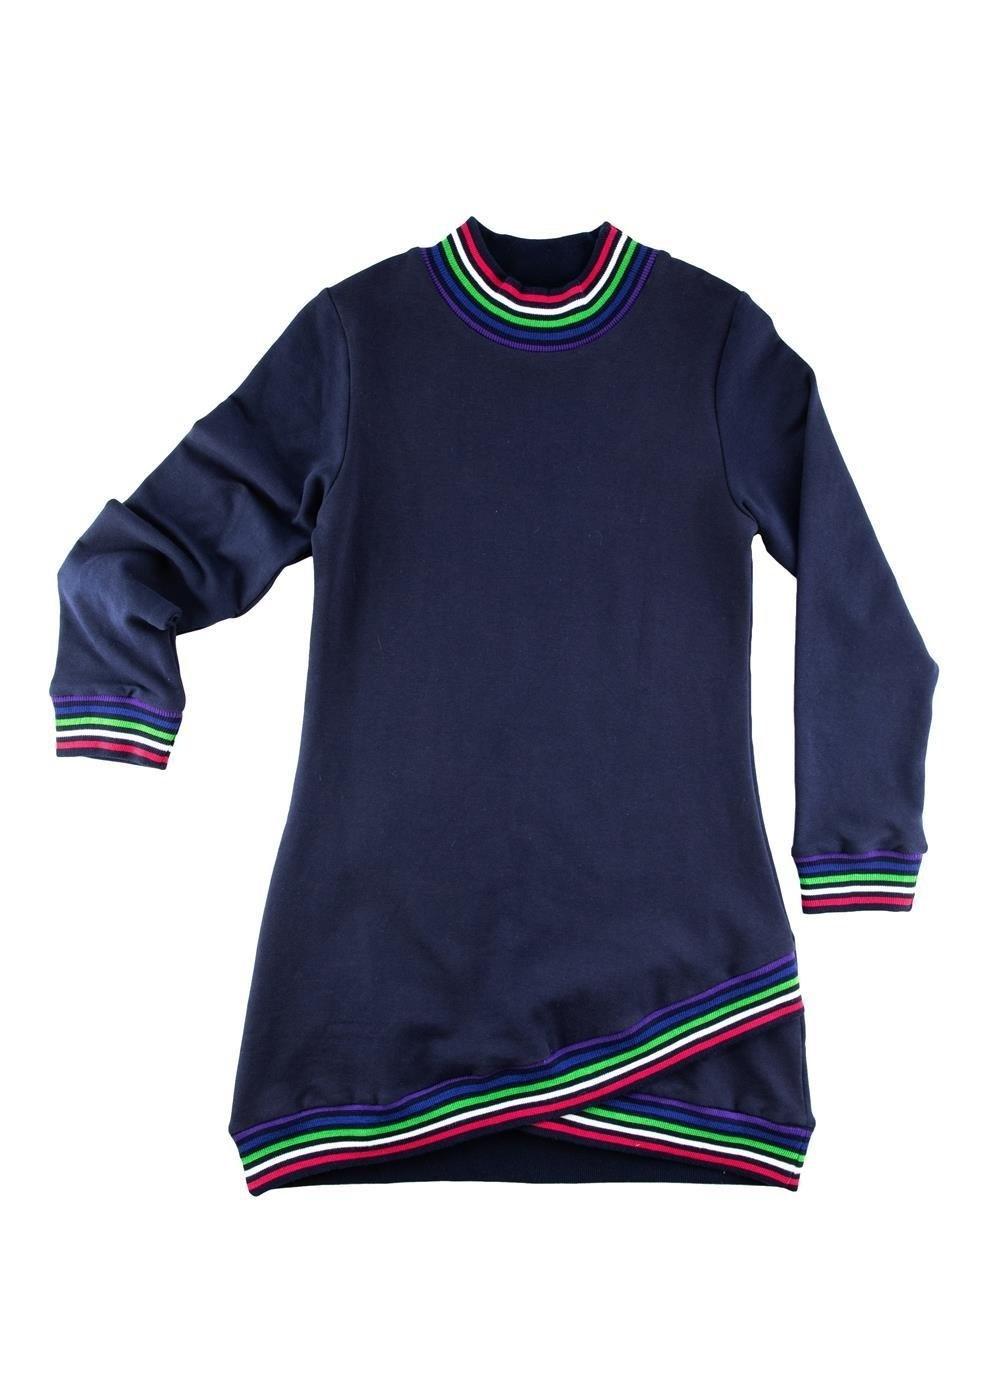 Florence Eiseman Knit Sweatshirt Dress